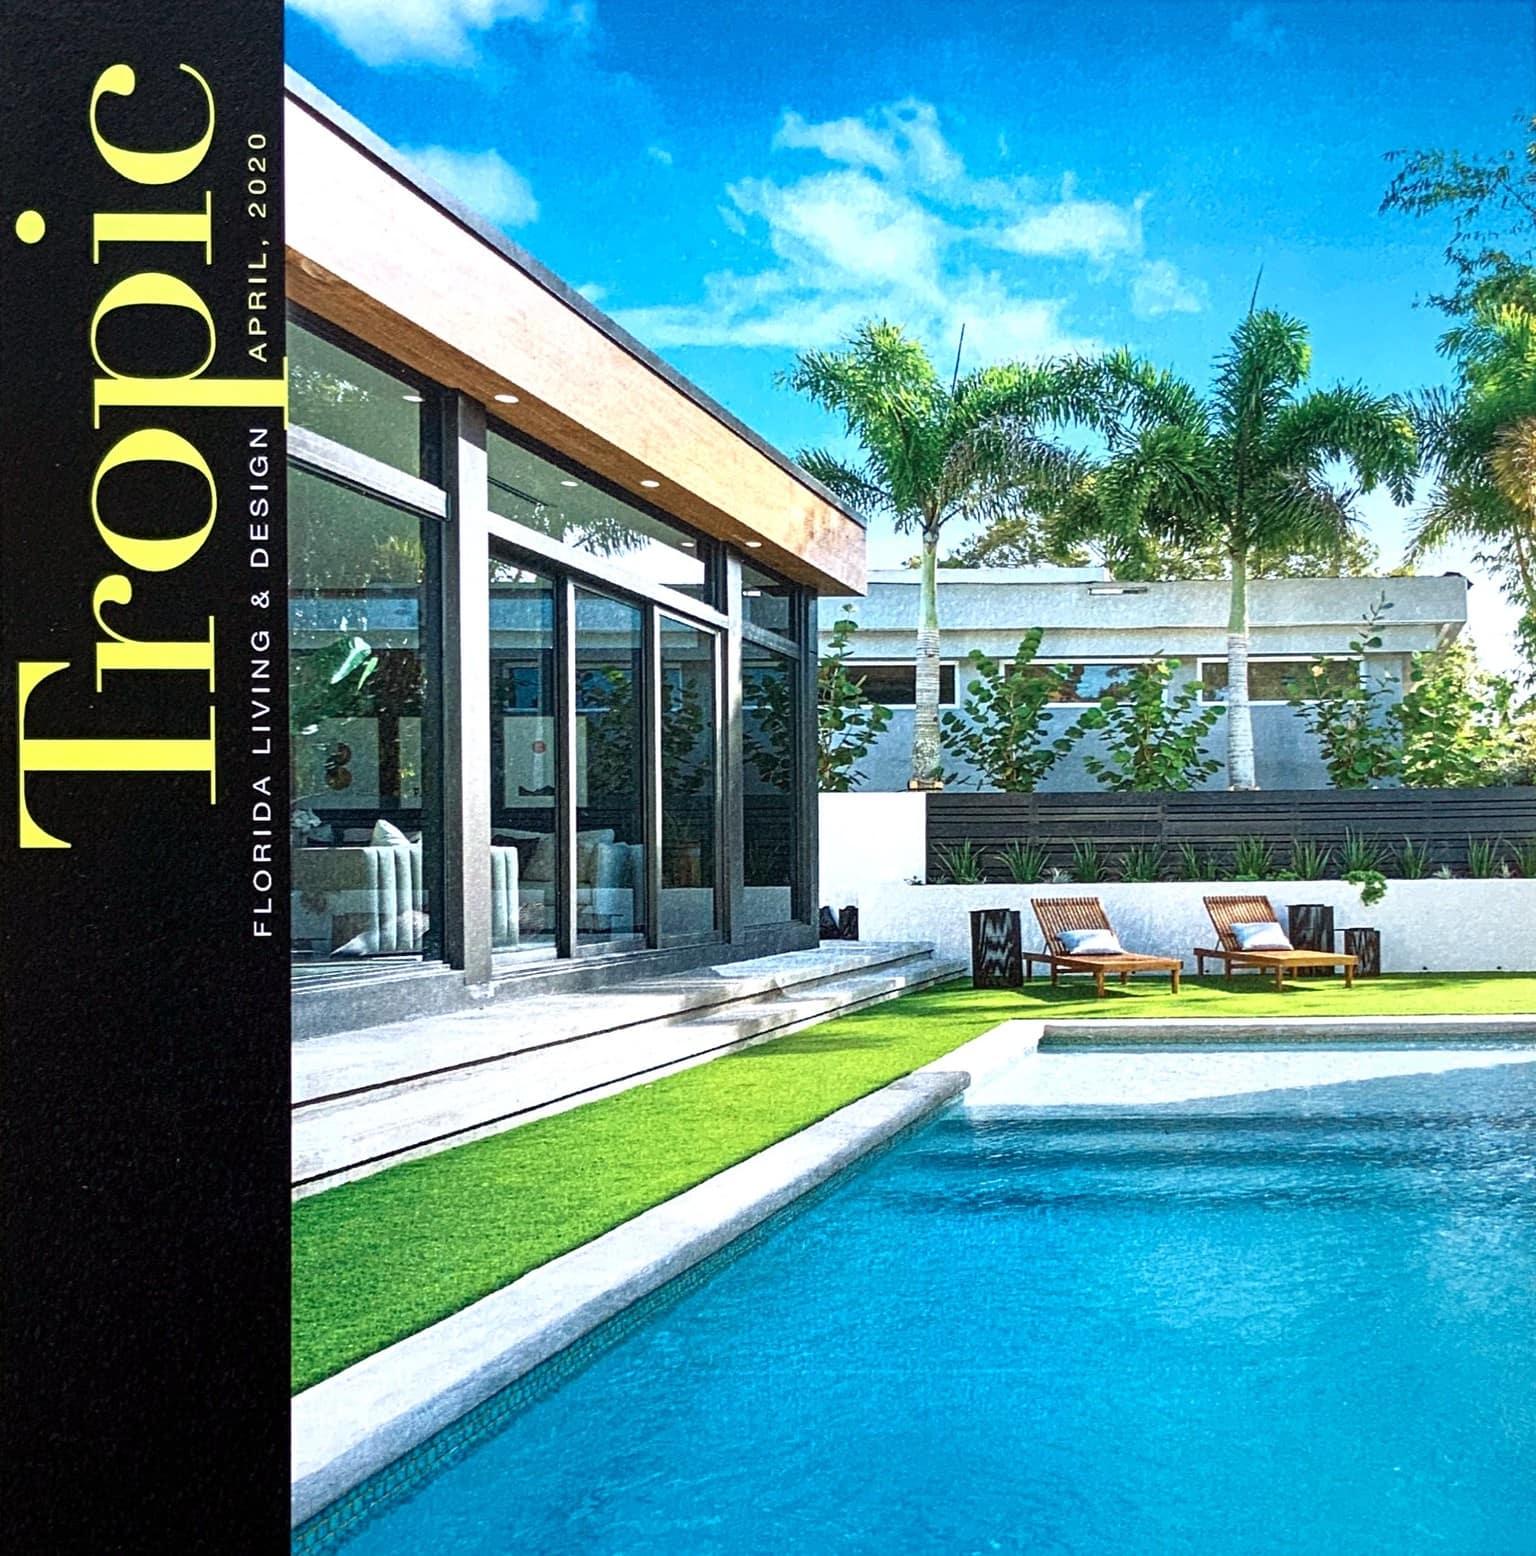 Tropic Magazine cover Studio 818 MidMod House